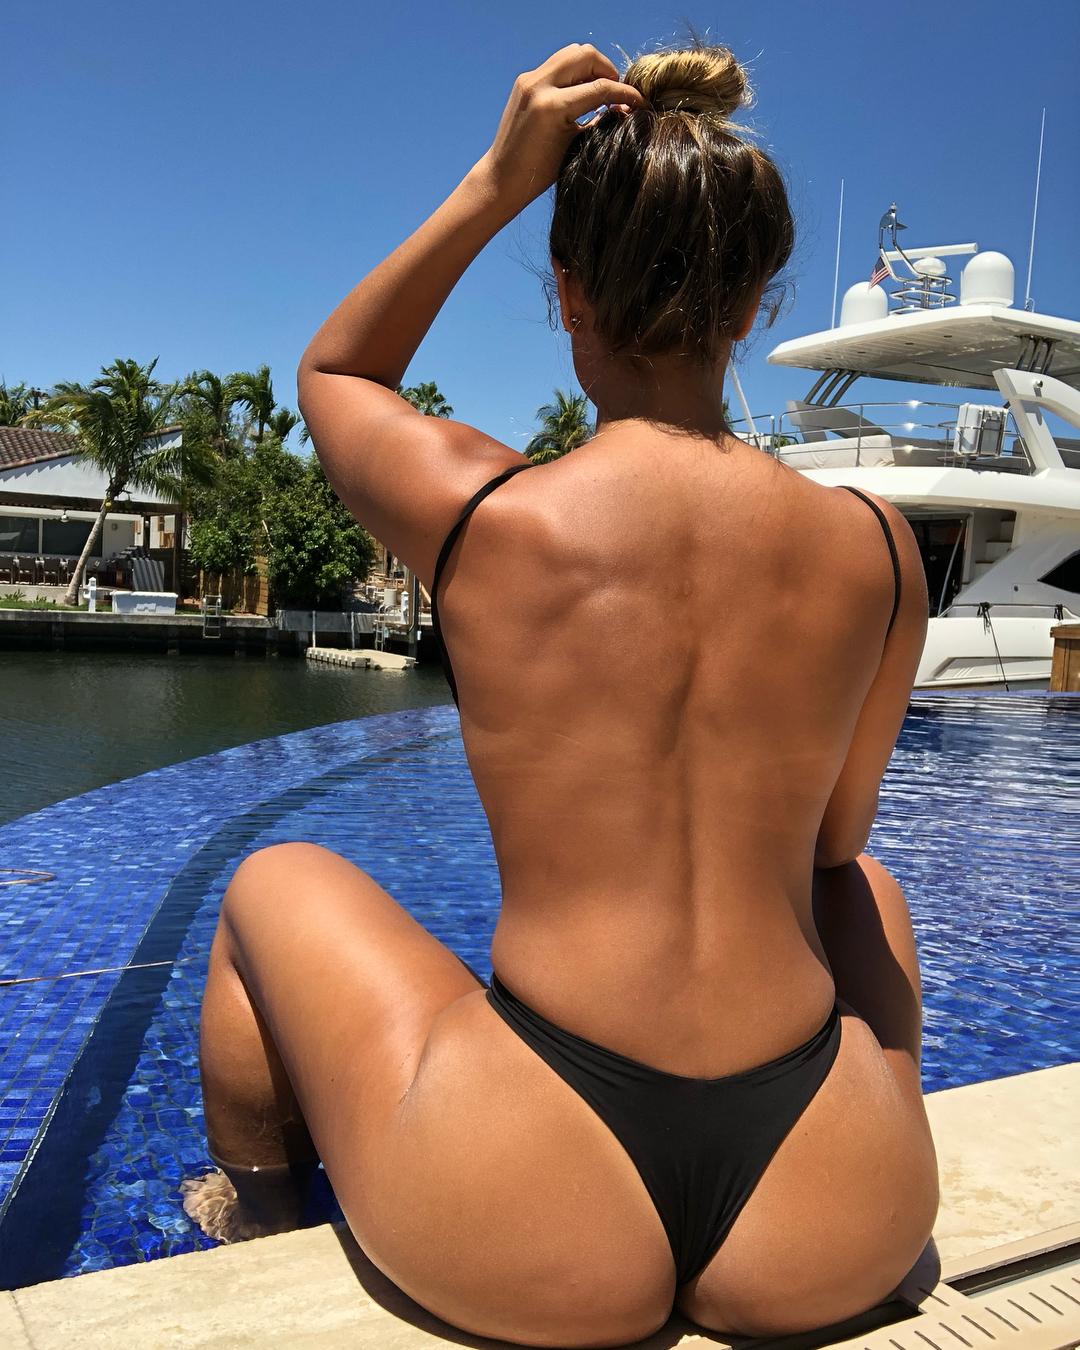 Natalia Garibotto Nude Onlyfans Leaked 0023